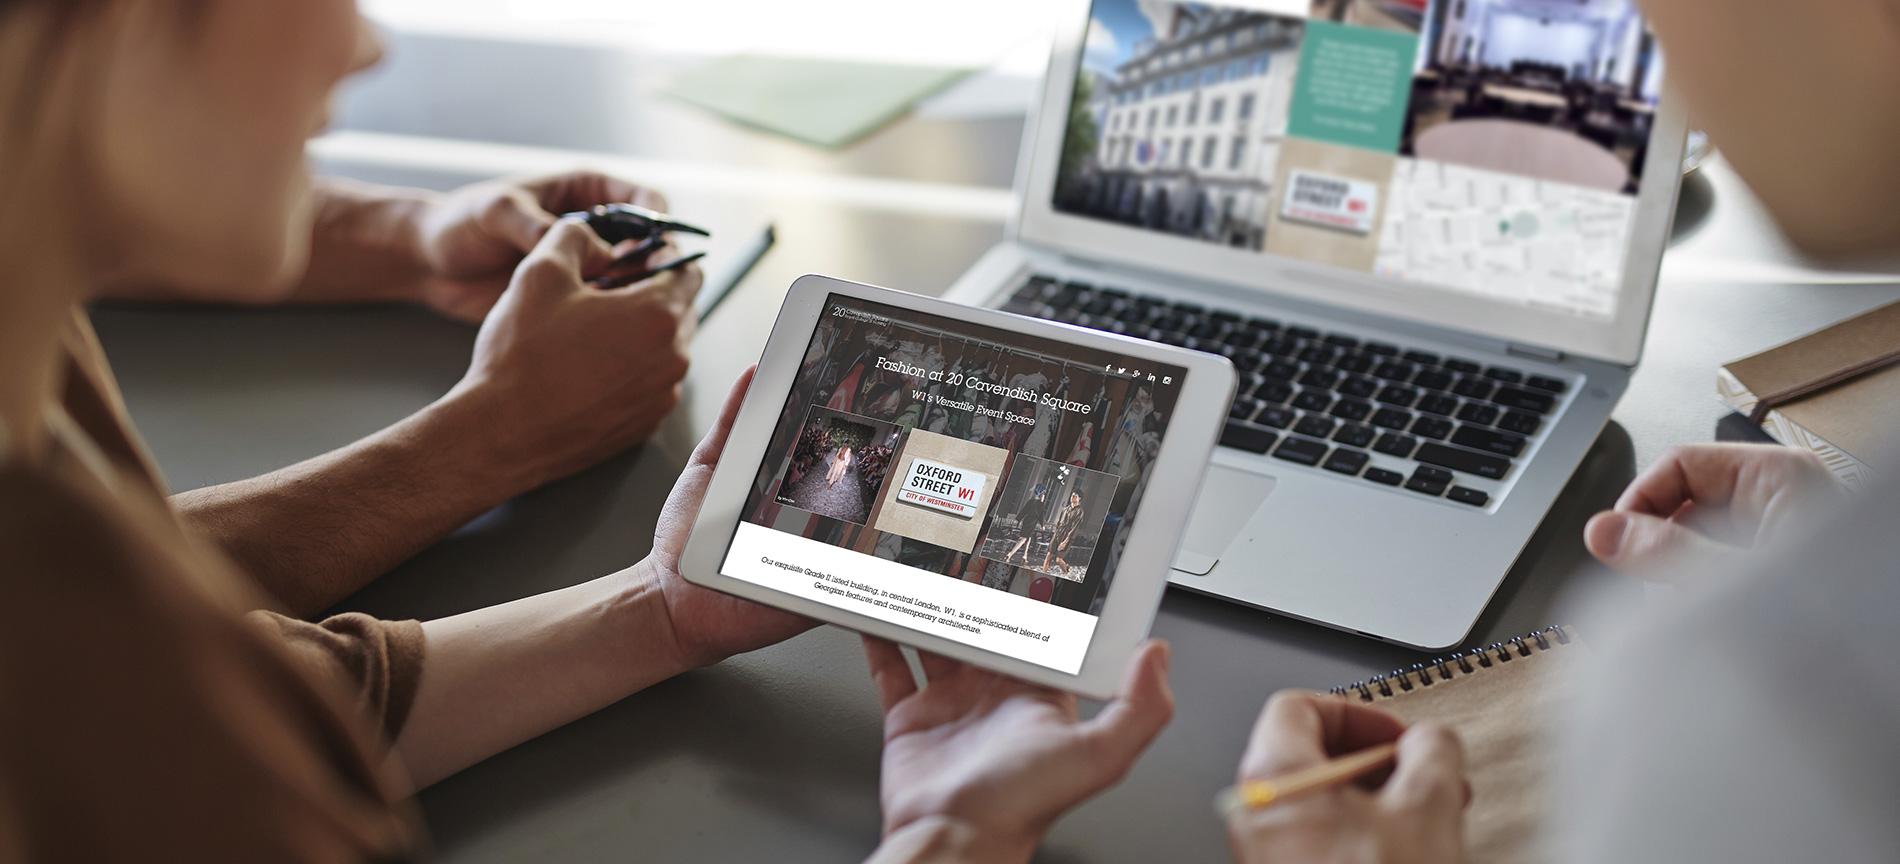 The Fashion Campaign landing page on the 20 Cavendish Square website - desktop